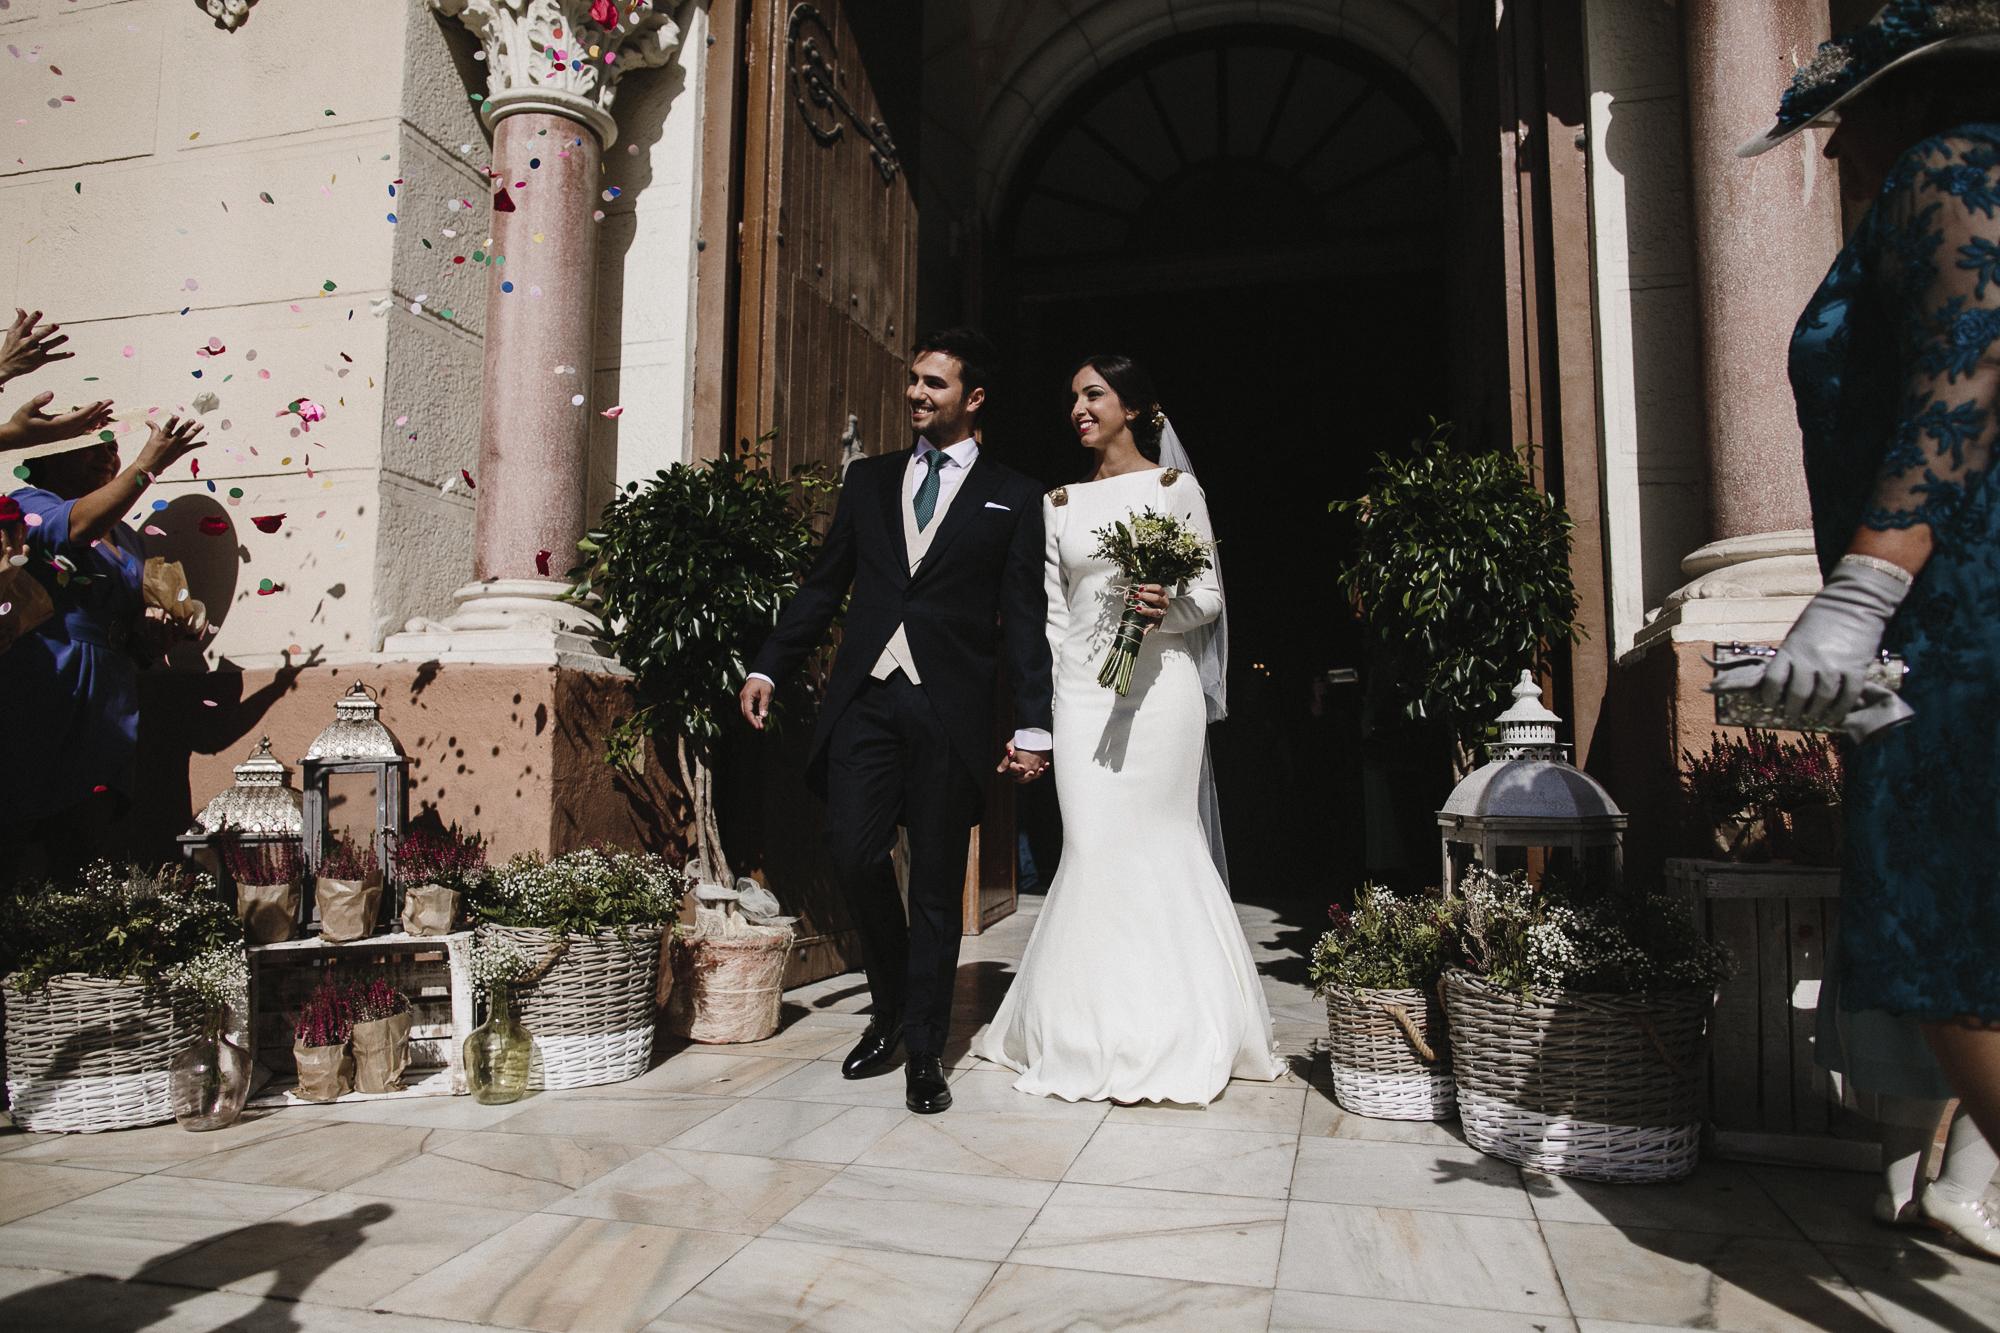 alfonso_flores_destination_wedding_photogrpaher_españa-62.jpg